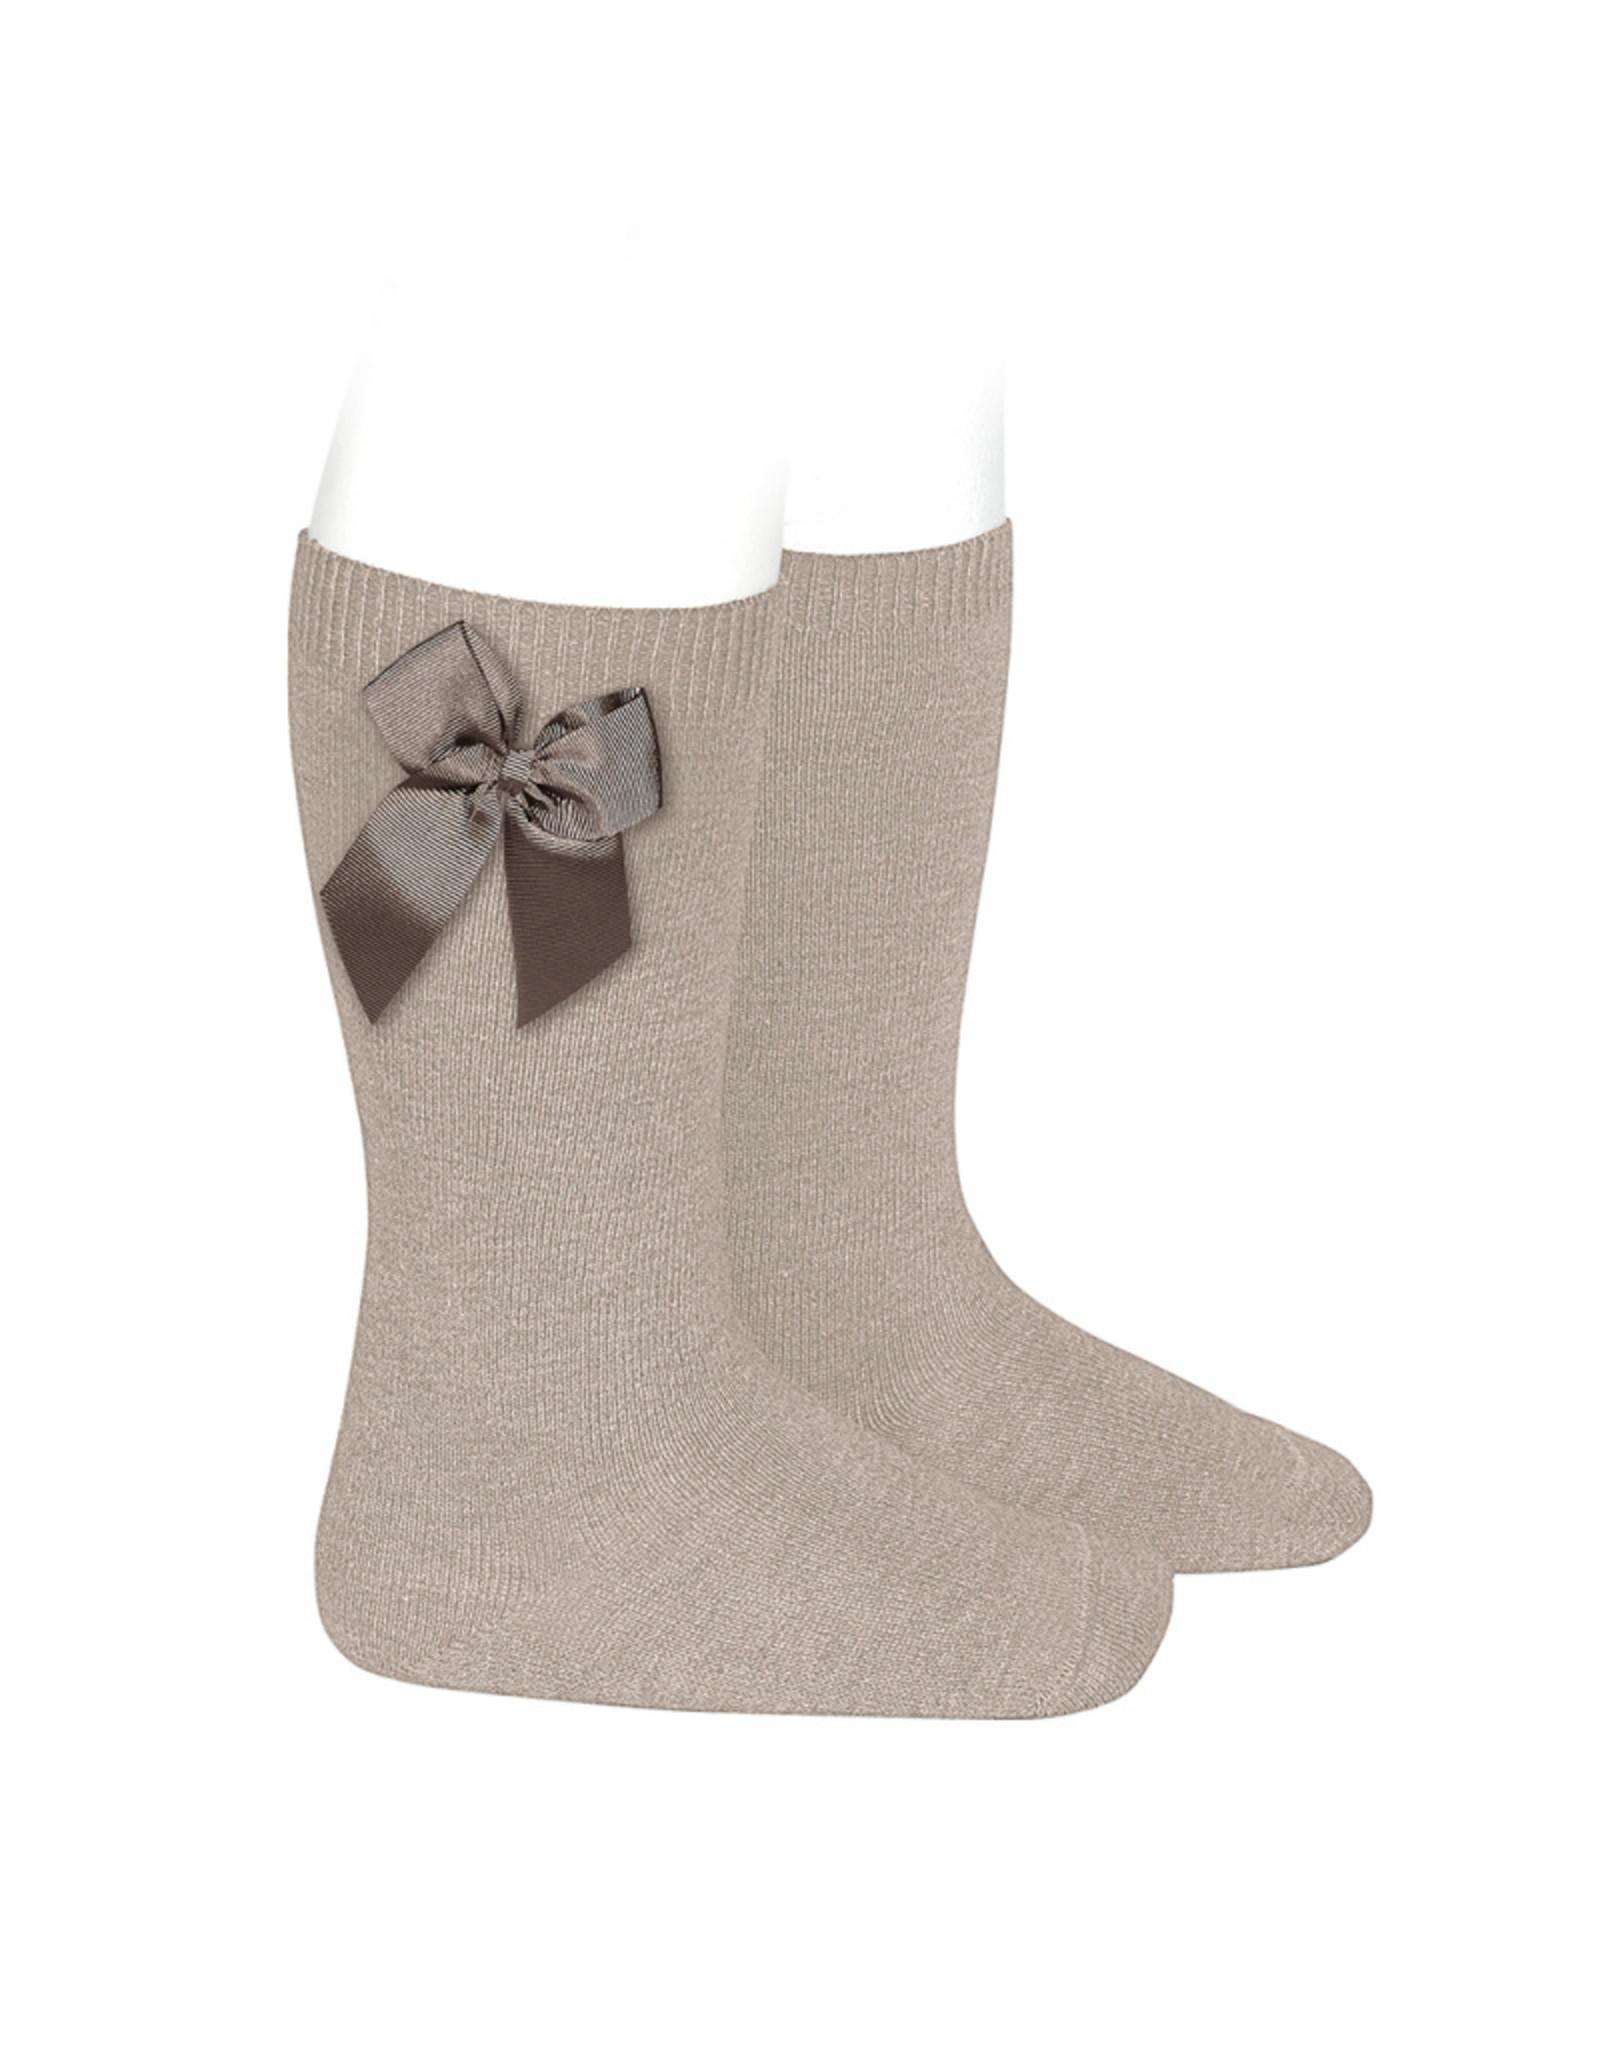 CONDOR Stone Knee Socks with Bow